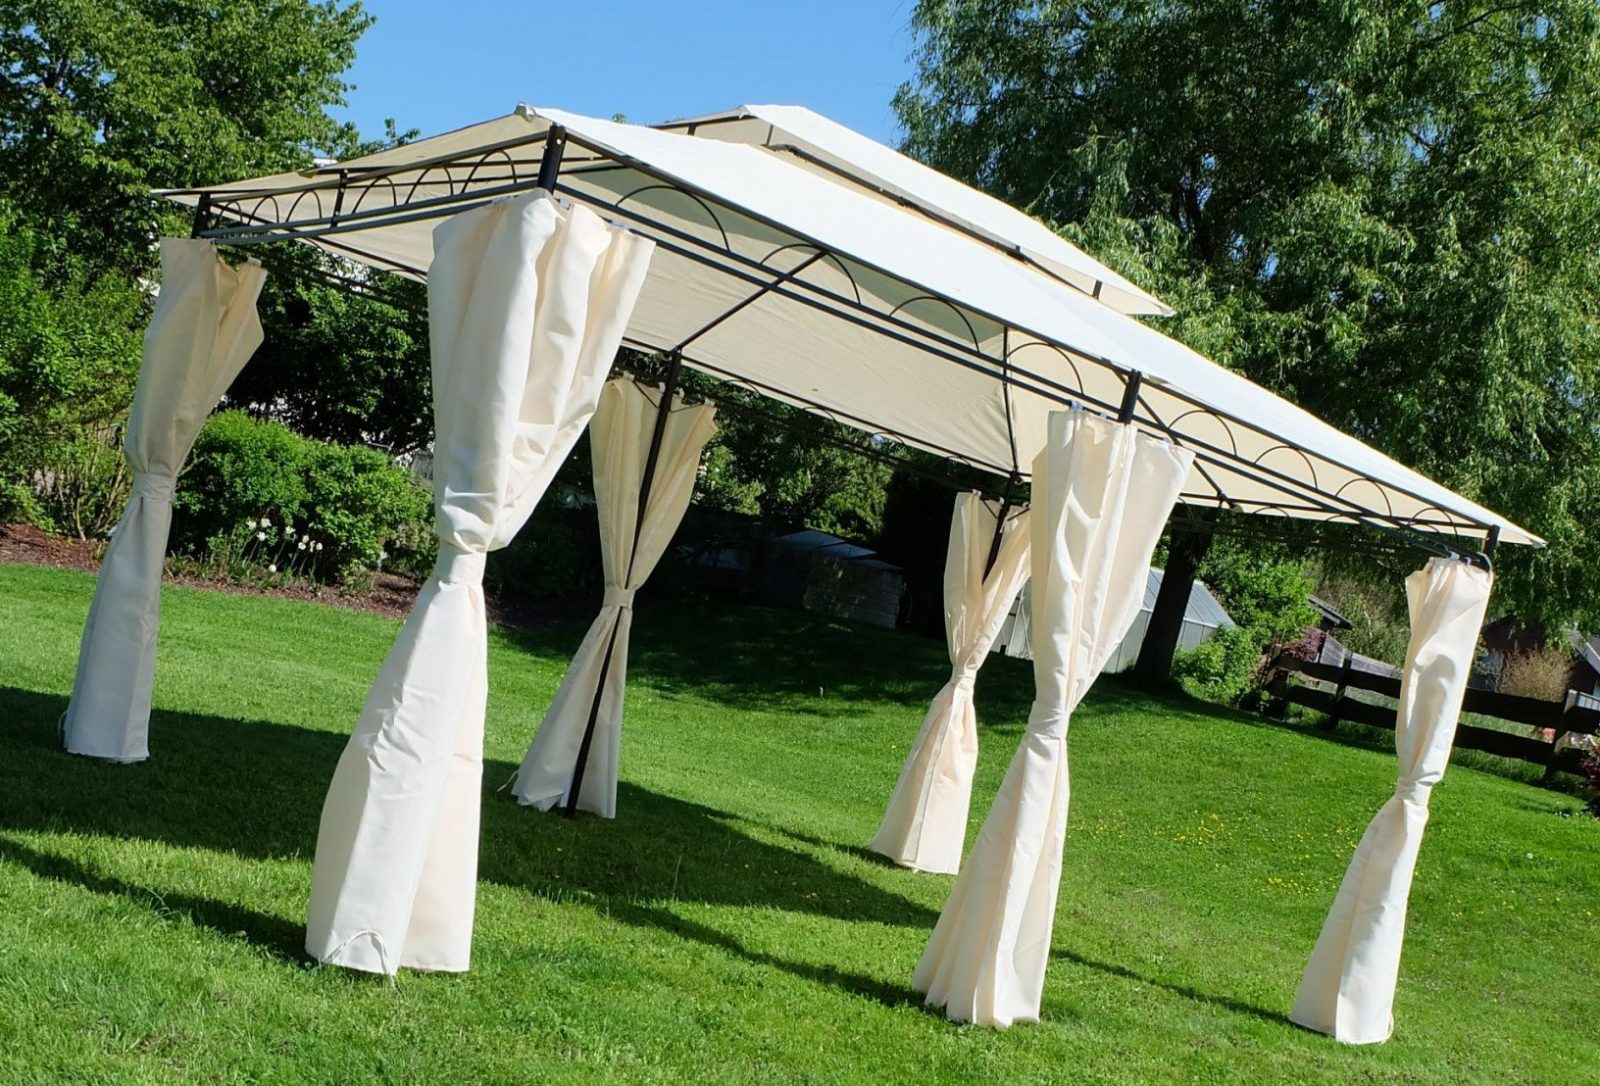 Pavillon Dach Wasserdicht Pavillon Dach Wasserdicht Auf Ma 799069 von Pavillon Dach 3X3M Wasserdicht Photo